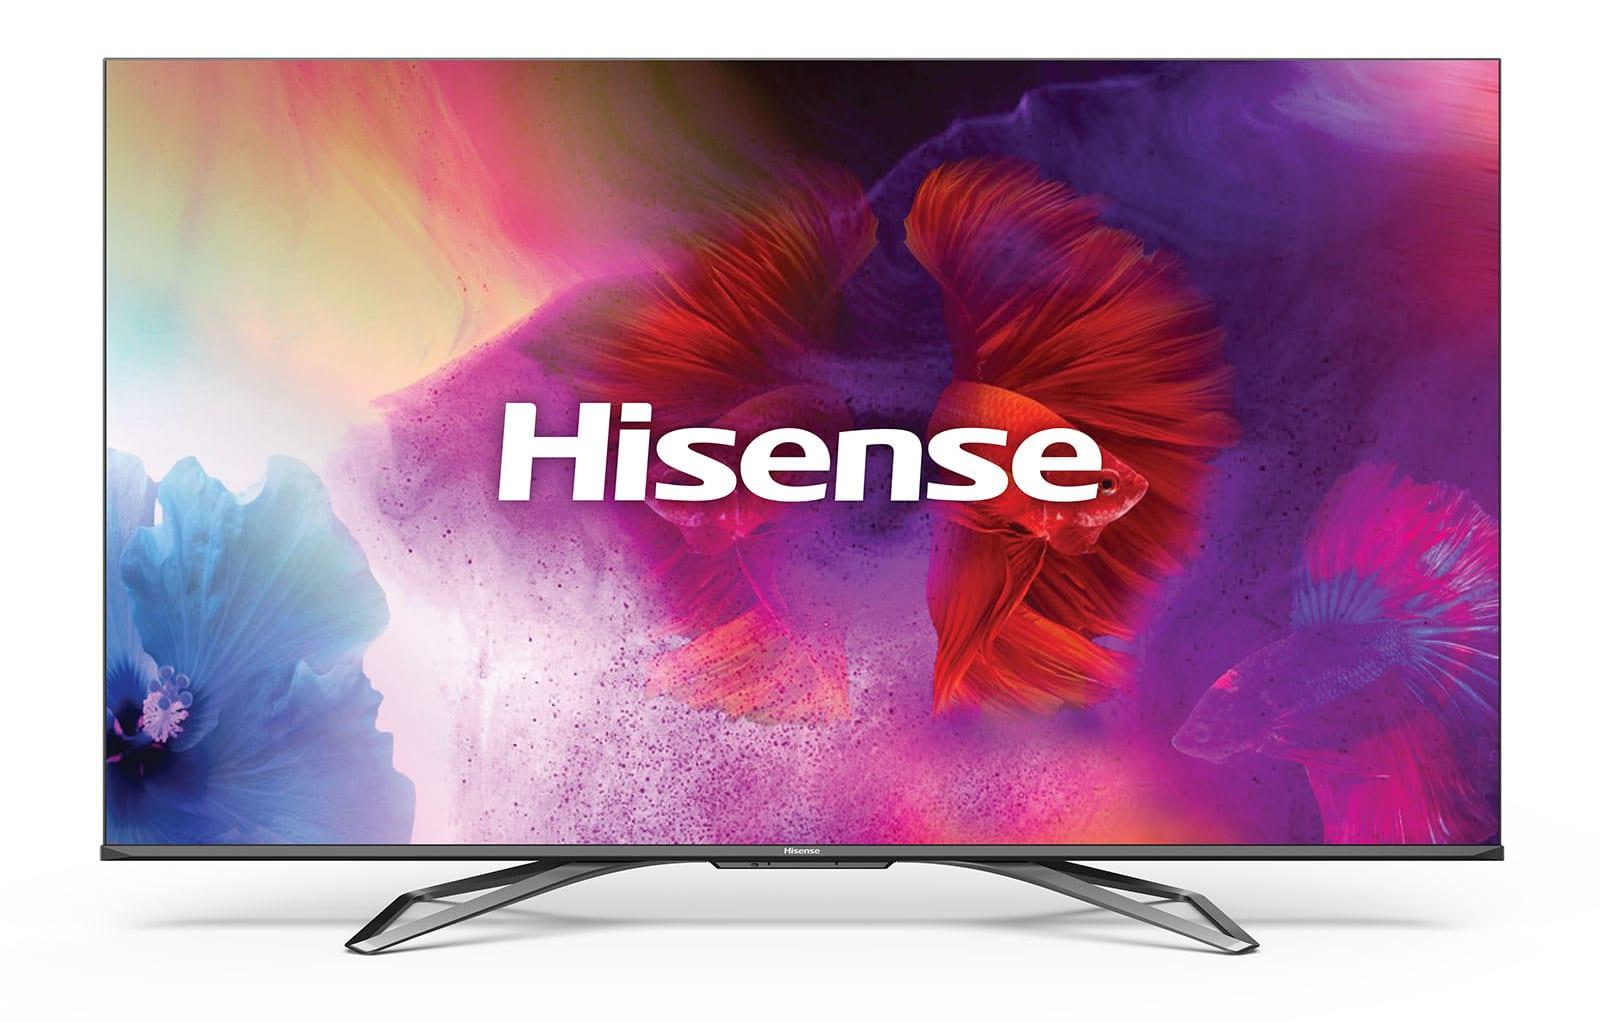 Hisense H9G 4K quantum dot TVs